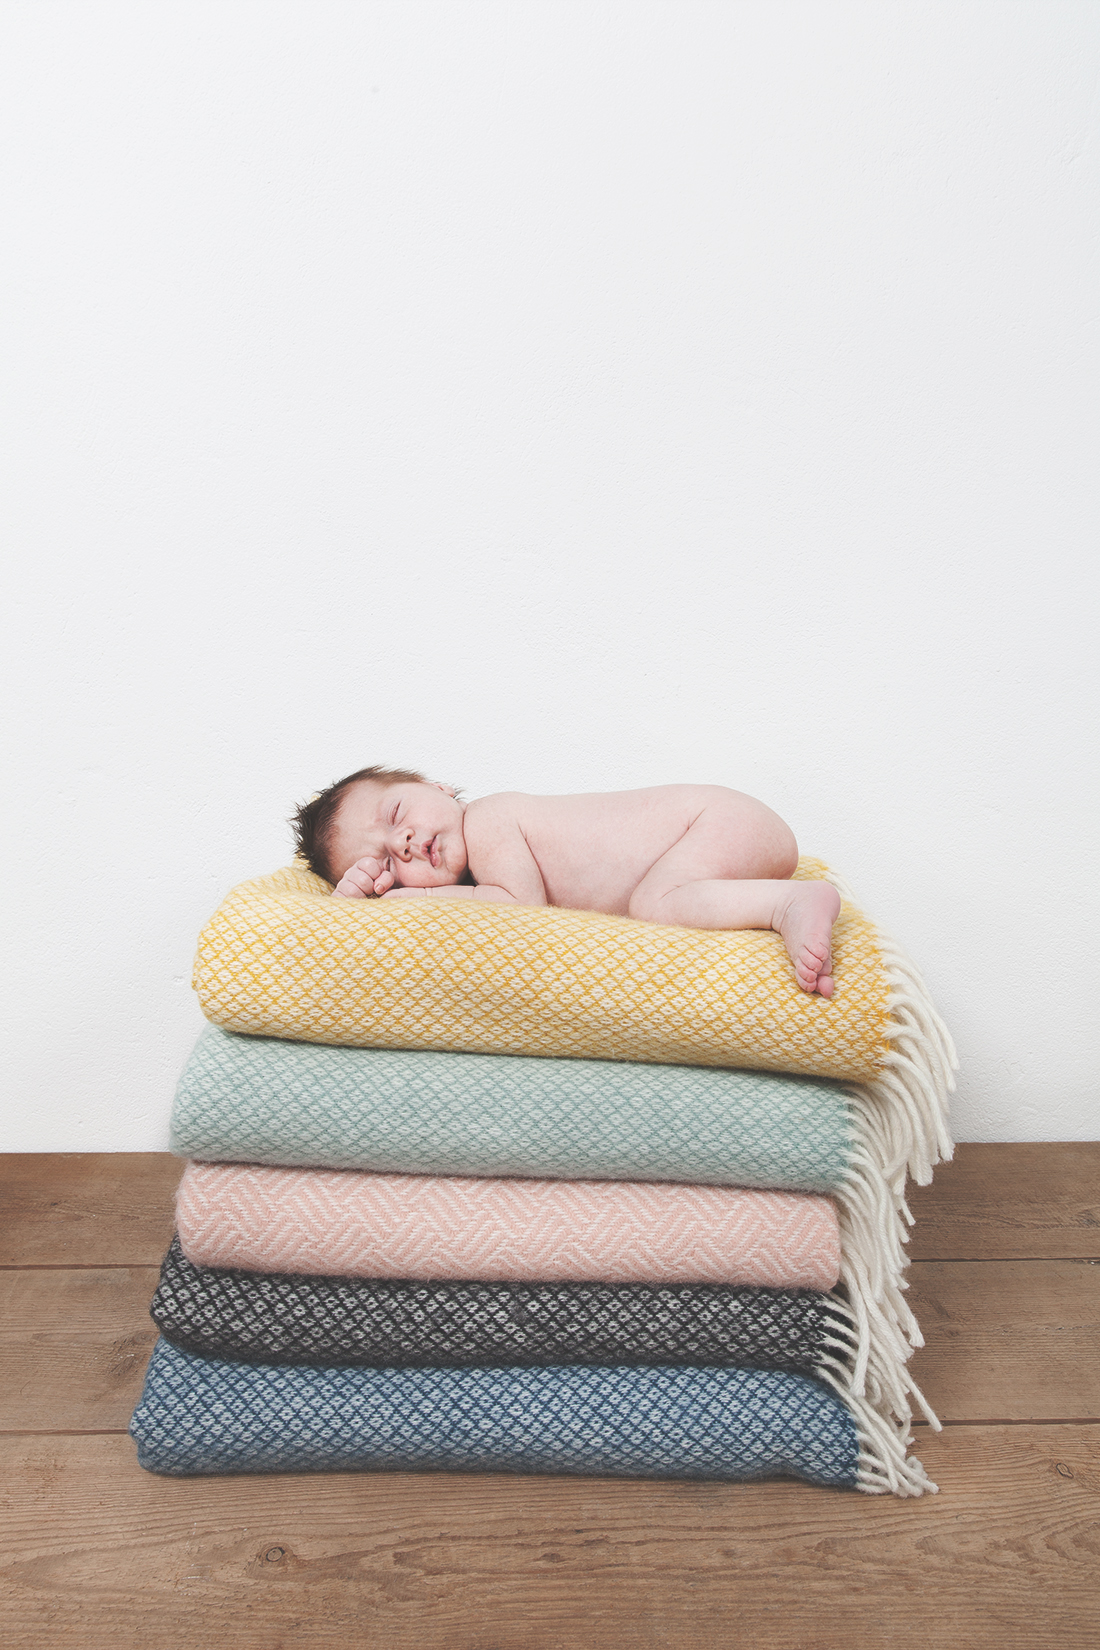 Neugeborenes_Baby_auf_Deckenstapel © Babyfotografie Berlin/ Miriam Ellerbrake Little Monkey Photography, Berlin